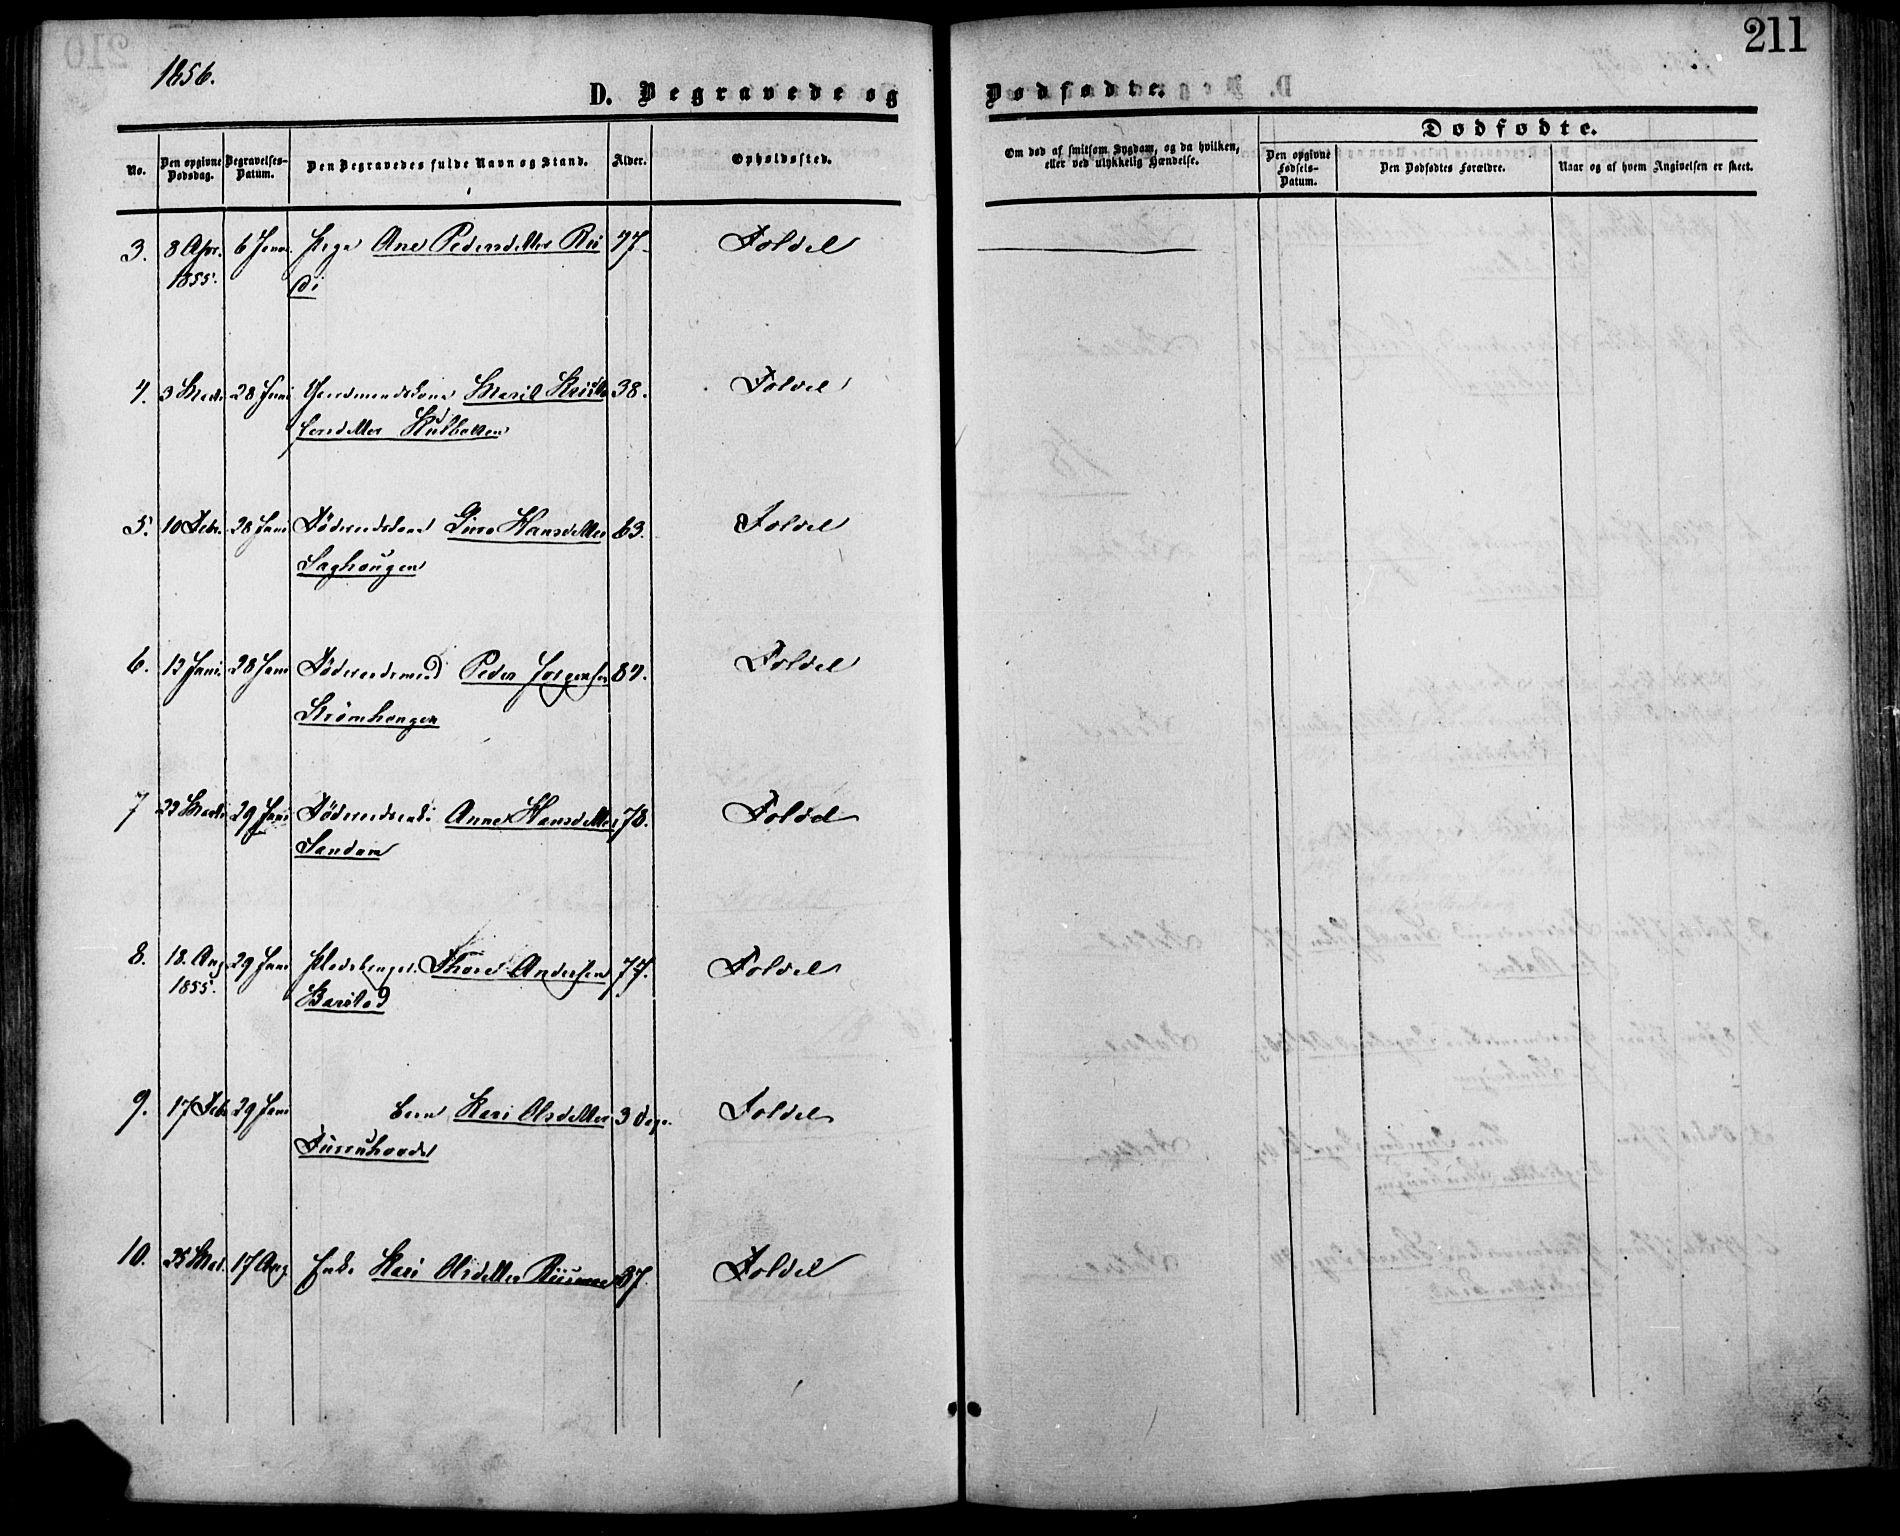 SAH, Lesja prestekontor, Ministerialbok nr. 7, 1854-1862, s. 211